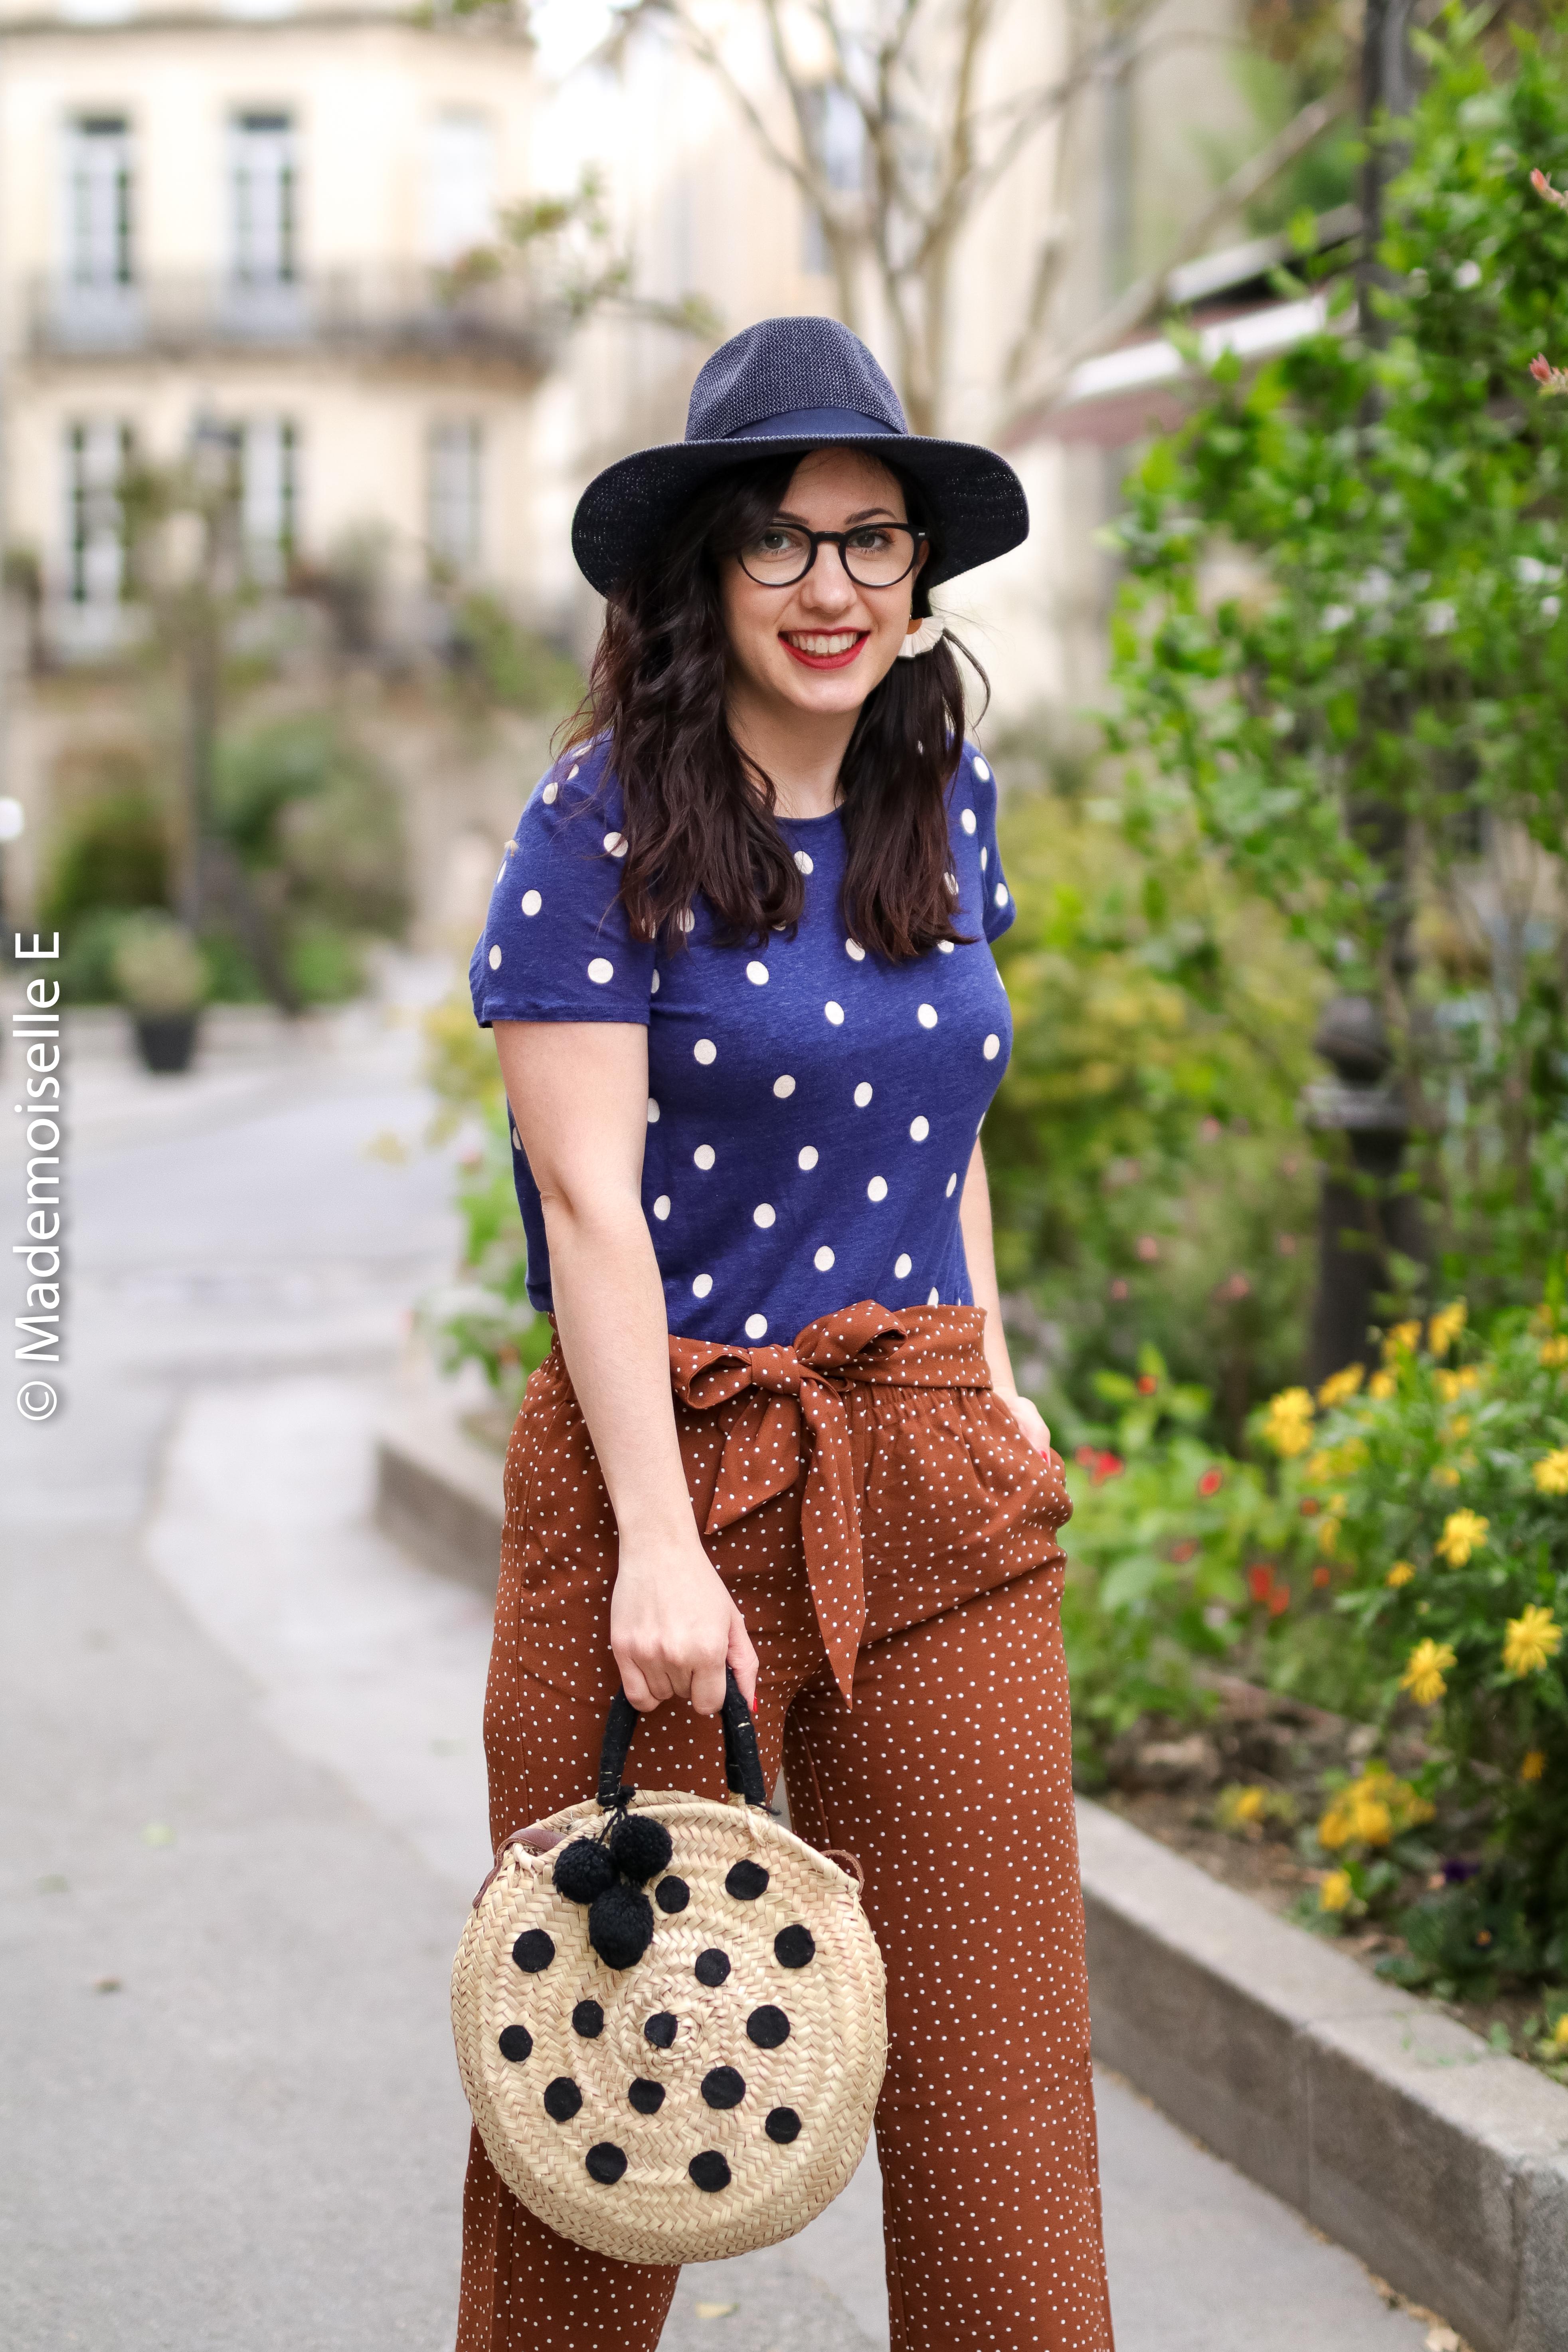 blog-mode-femme-total-look-a-pois-25-mademoiselle-e